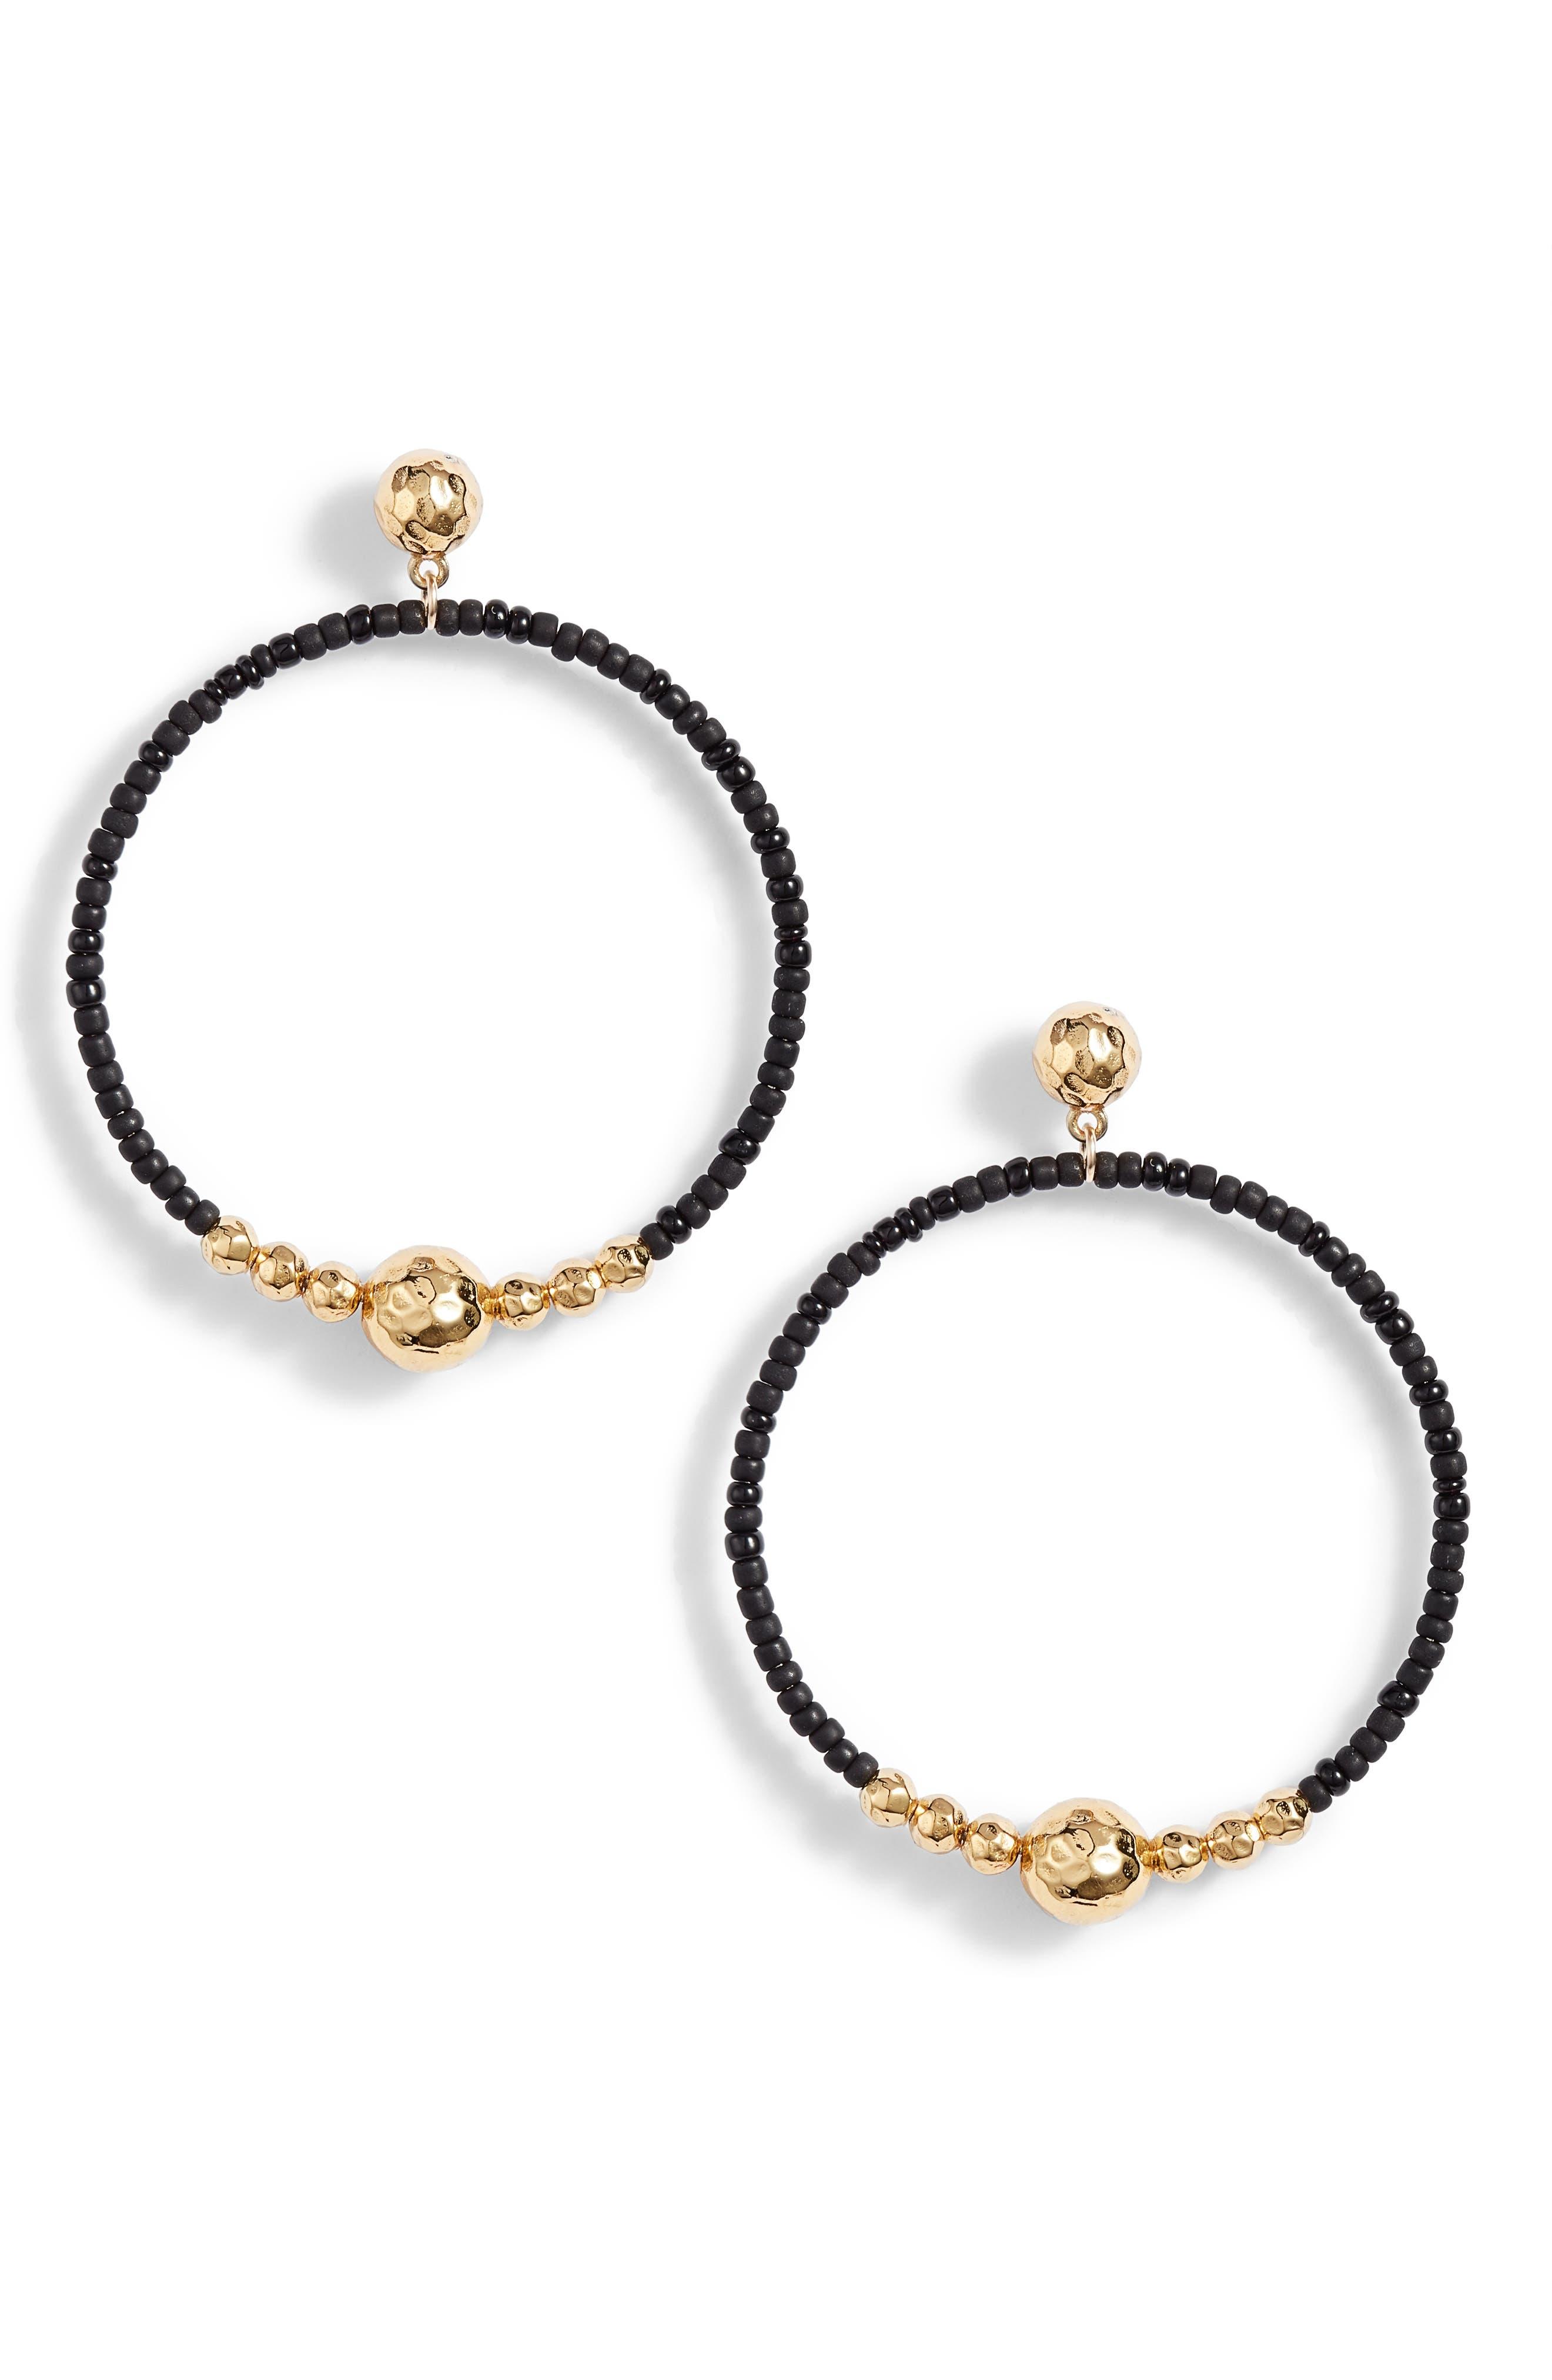 Sayulita Drop Hoop Earrings,                             Main thumbnail 1, color,                             Black